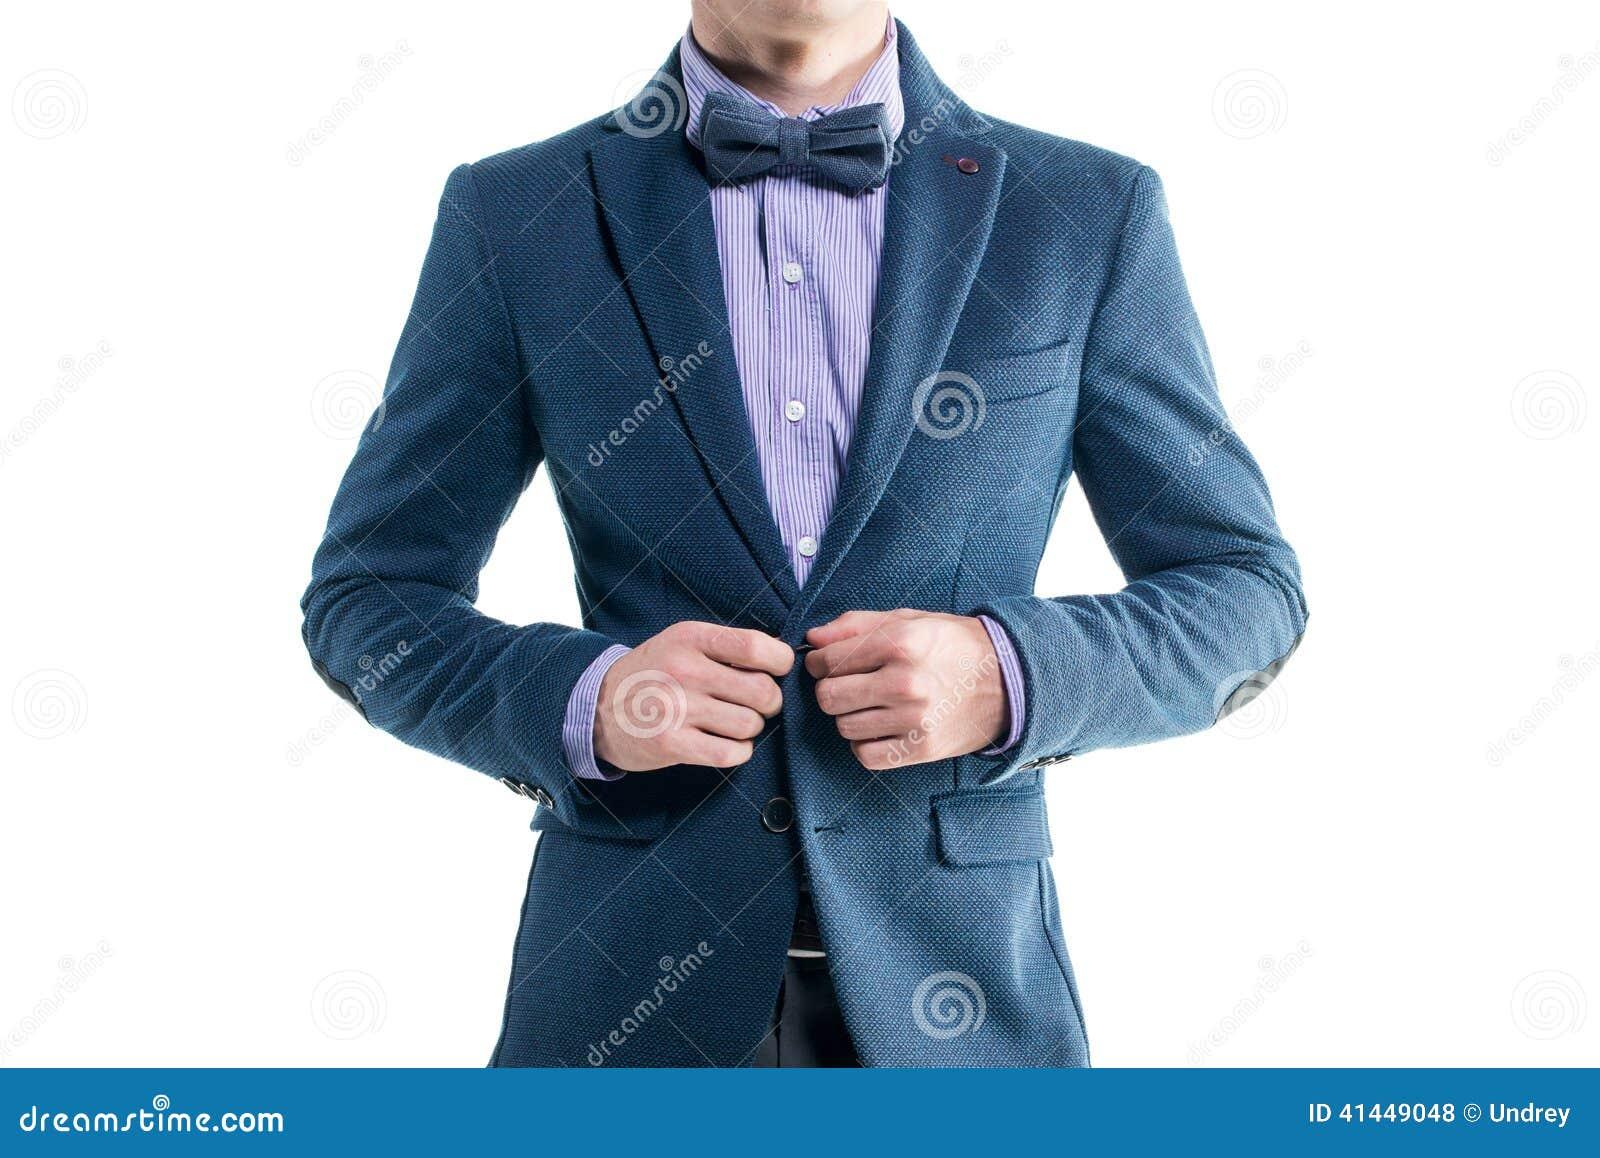 Handsome Elegant Young Fashion Man In Coat Tuxedo Stock Photo 41449068